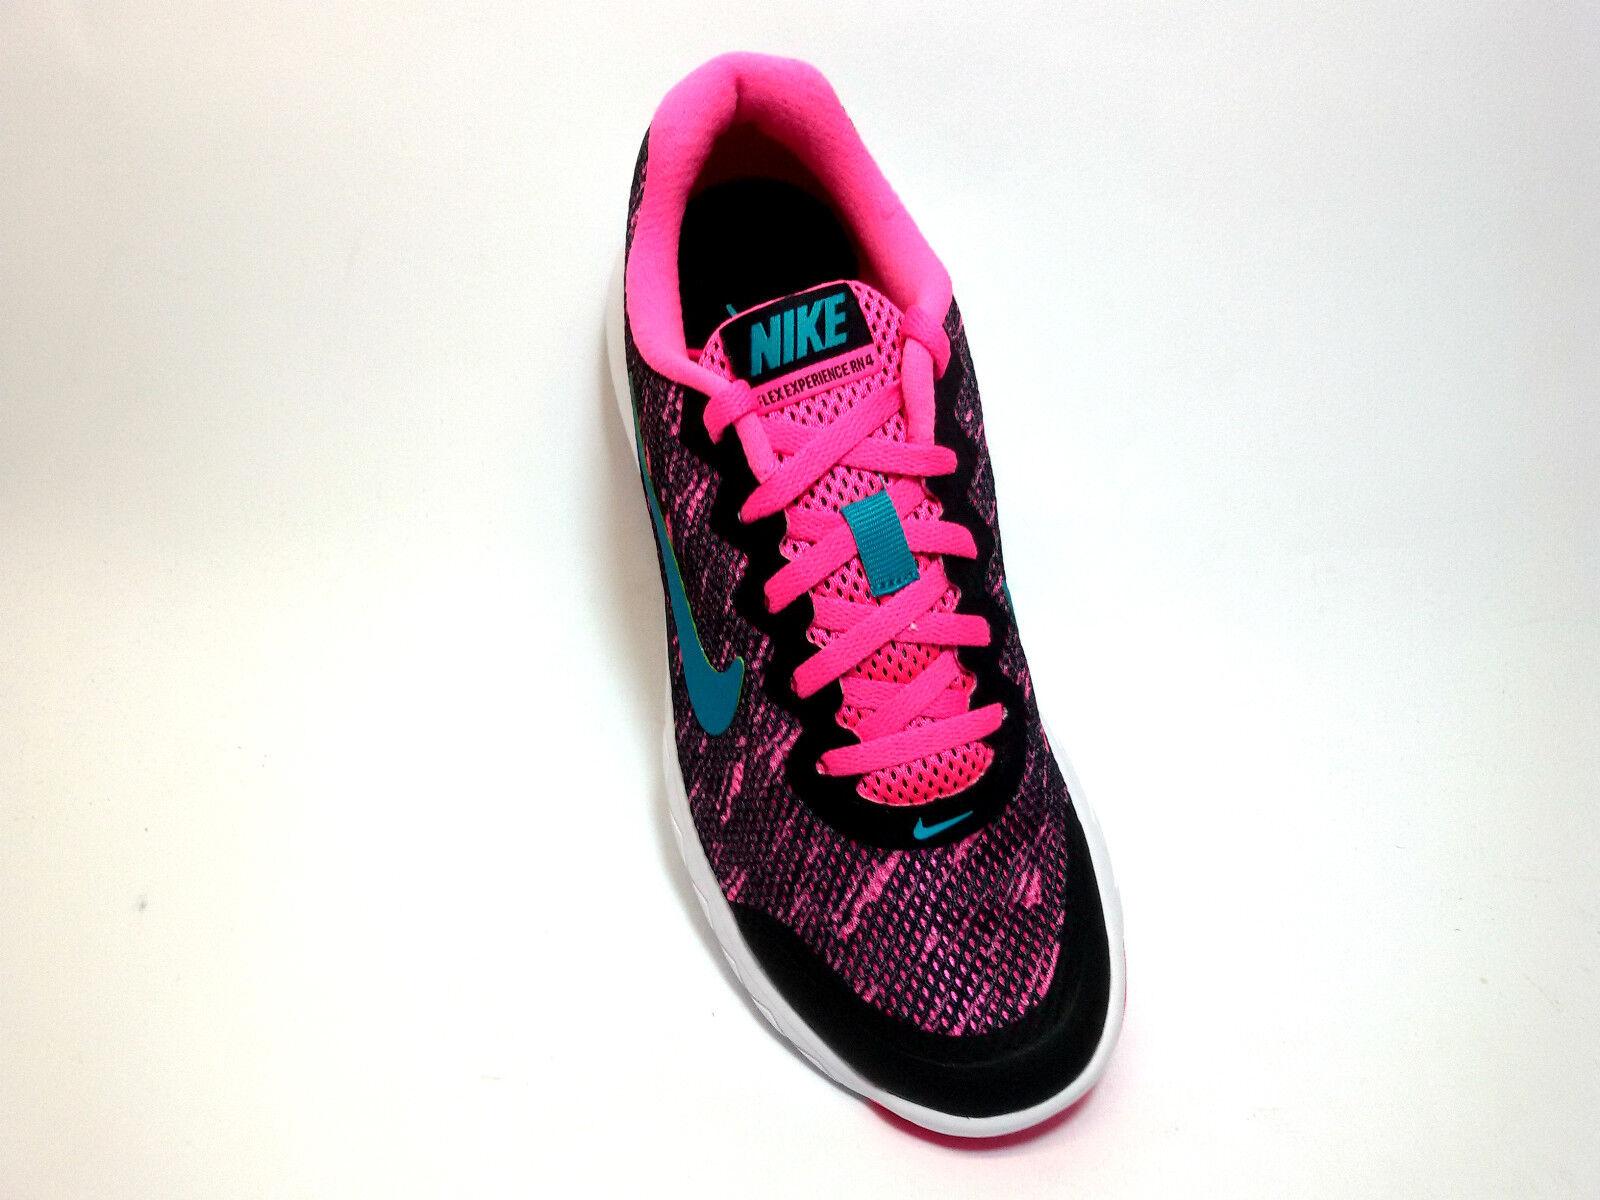 separation shoes ee012 64d61 ... NIKE WMNS FLEX EXPERIENCE EXPERIENCE EXPERIENCE RN 4 PREM chaussures  femmes RUNNING SPORTSWEAR 749177 603 1bcfec ...